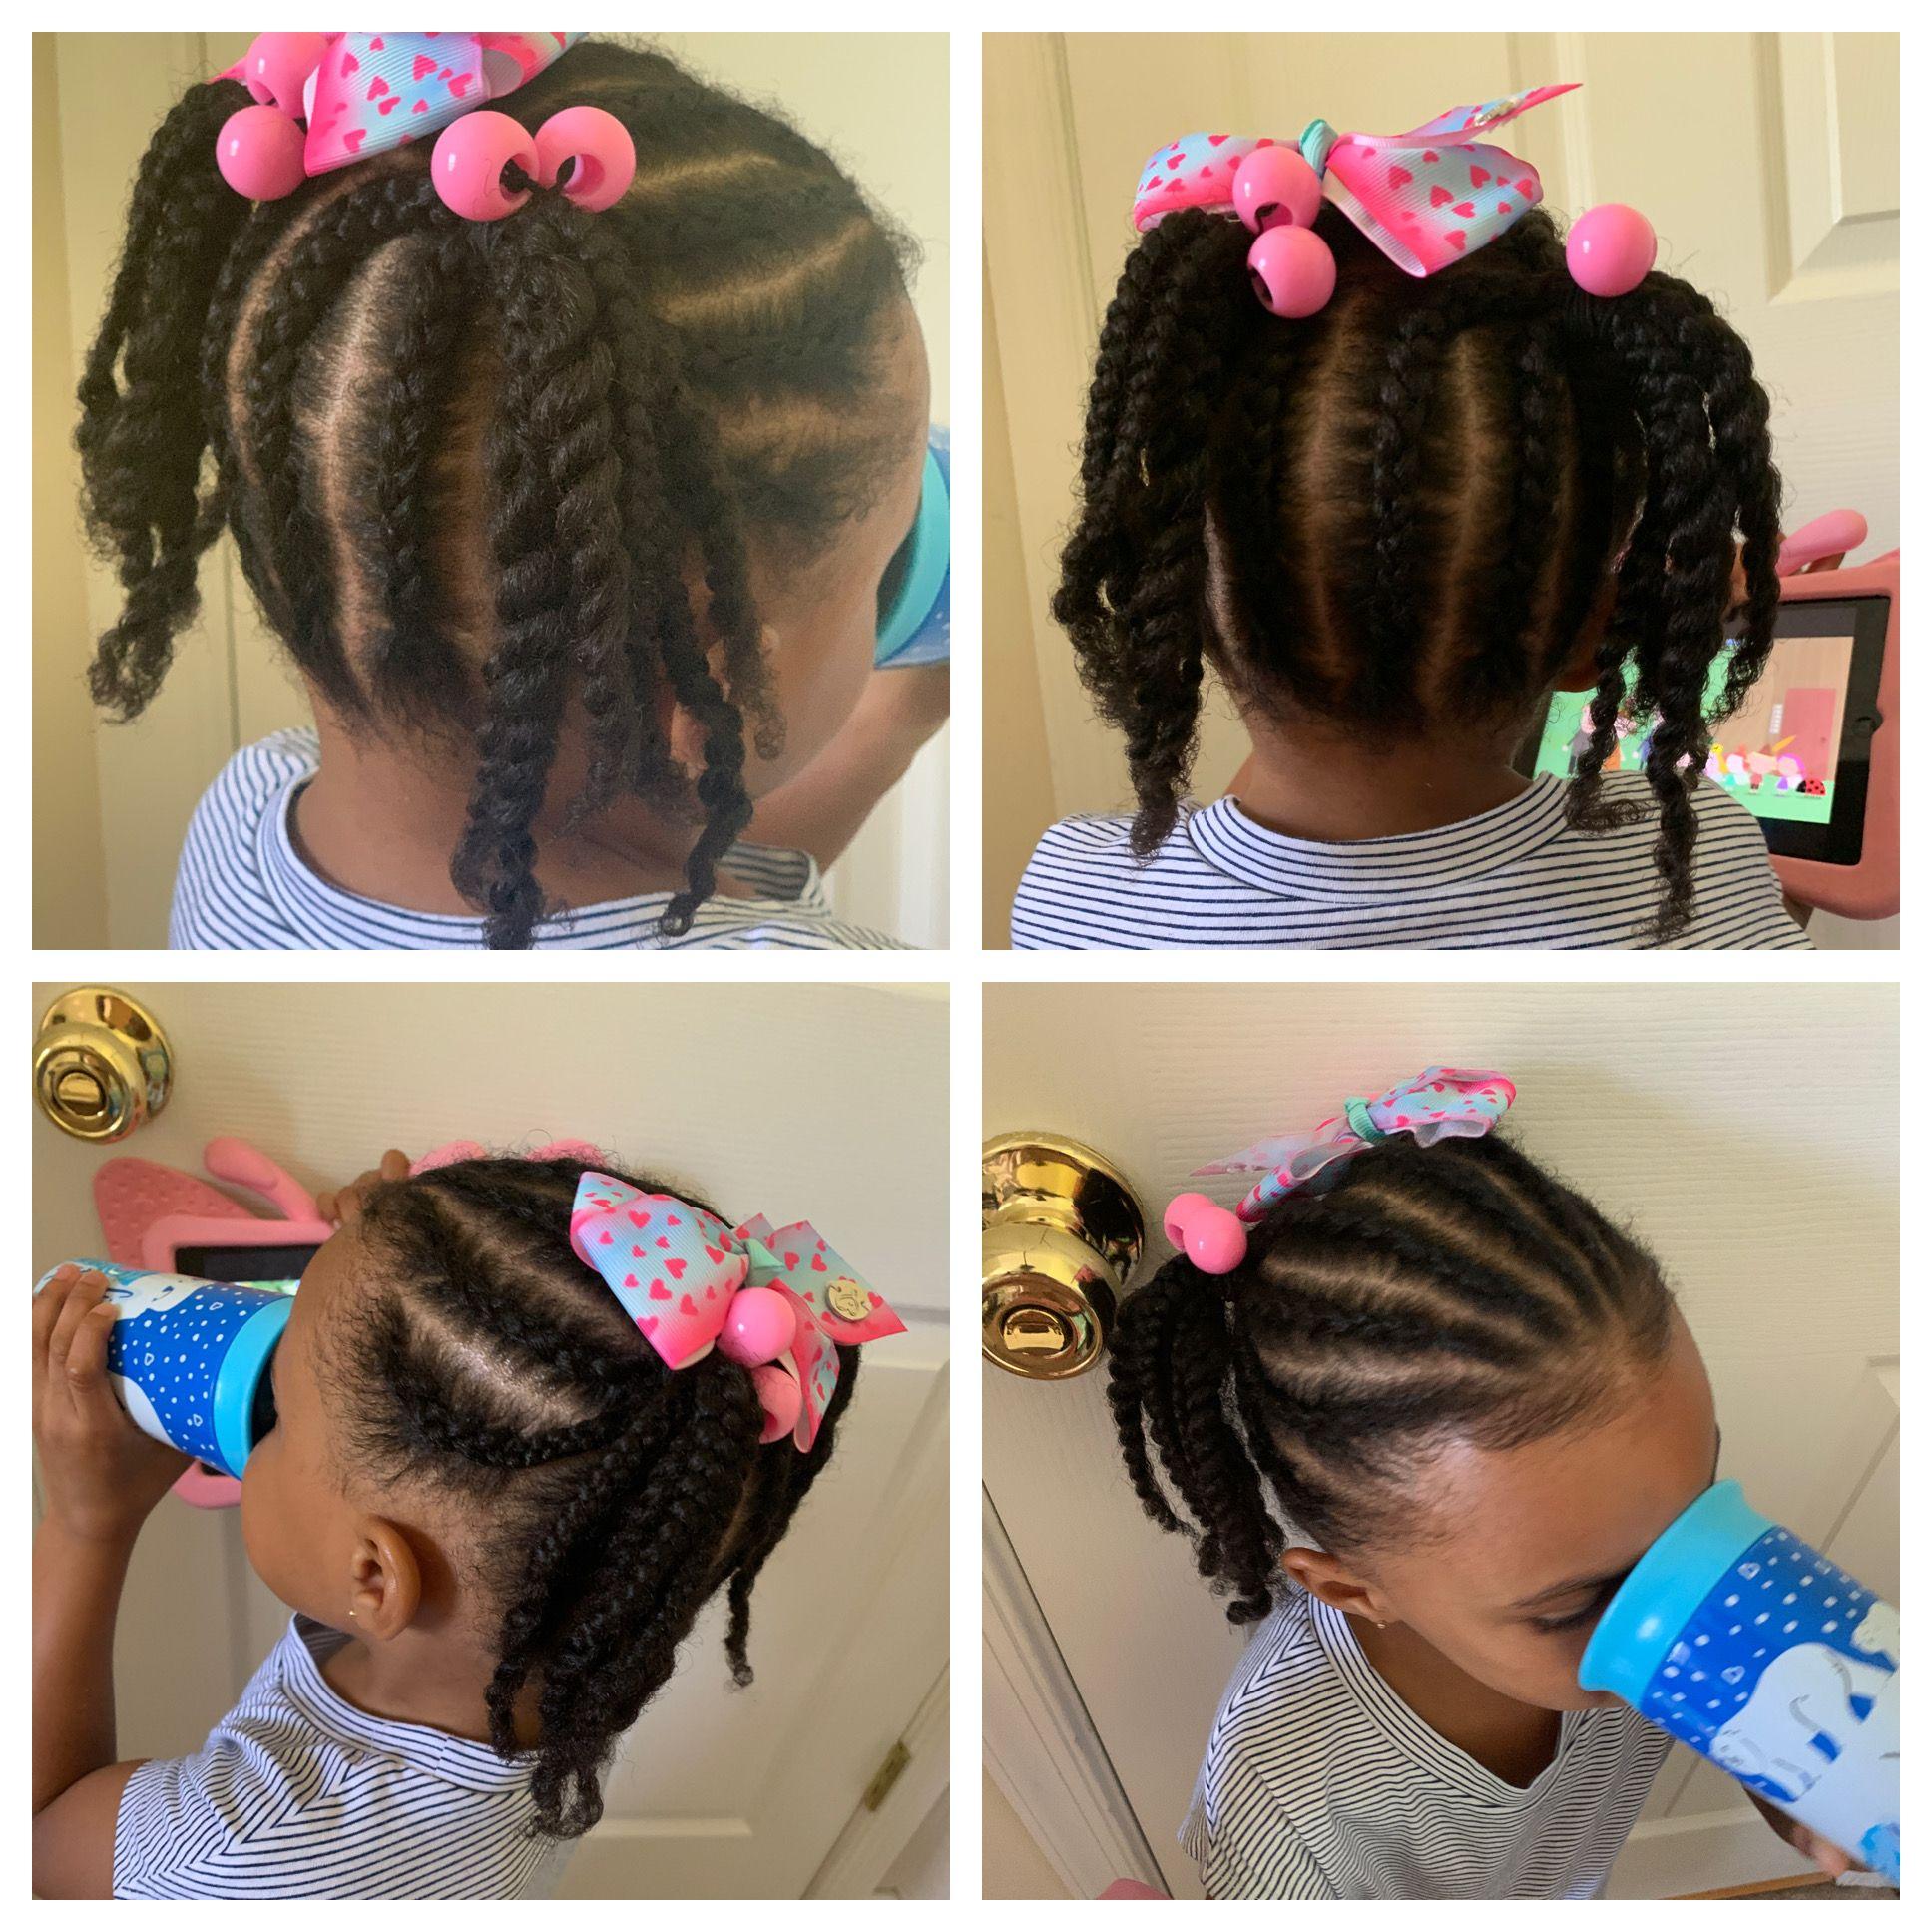 Little Girls Braided Hairstyle Akaramel Kiss Little Girl Braids Little Girl Braid Hairstyles Kids Hairstyles